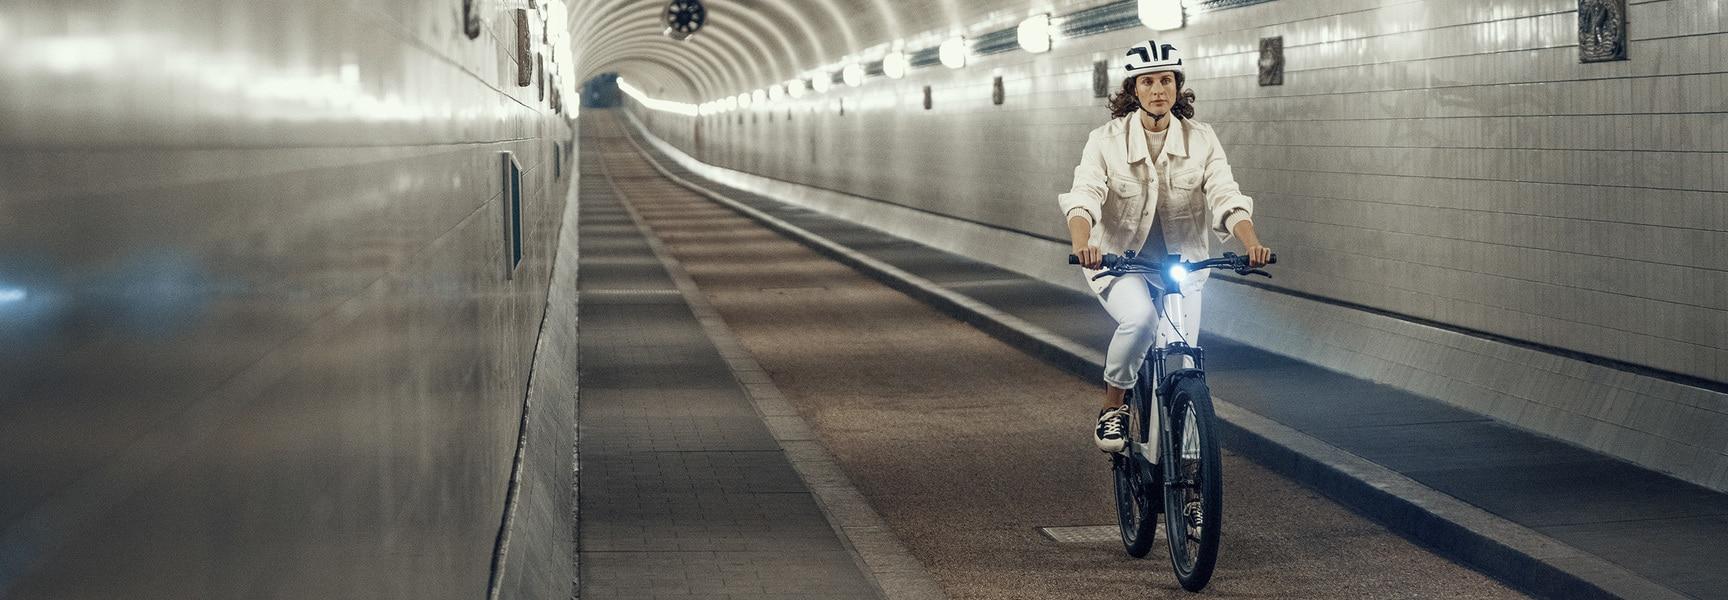 Frau auf e-Bike